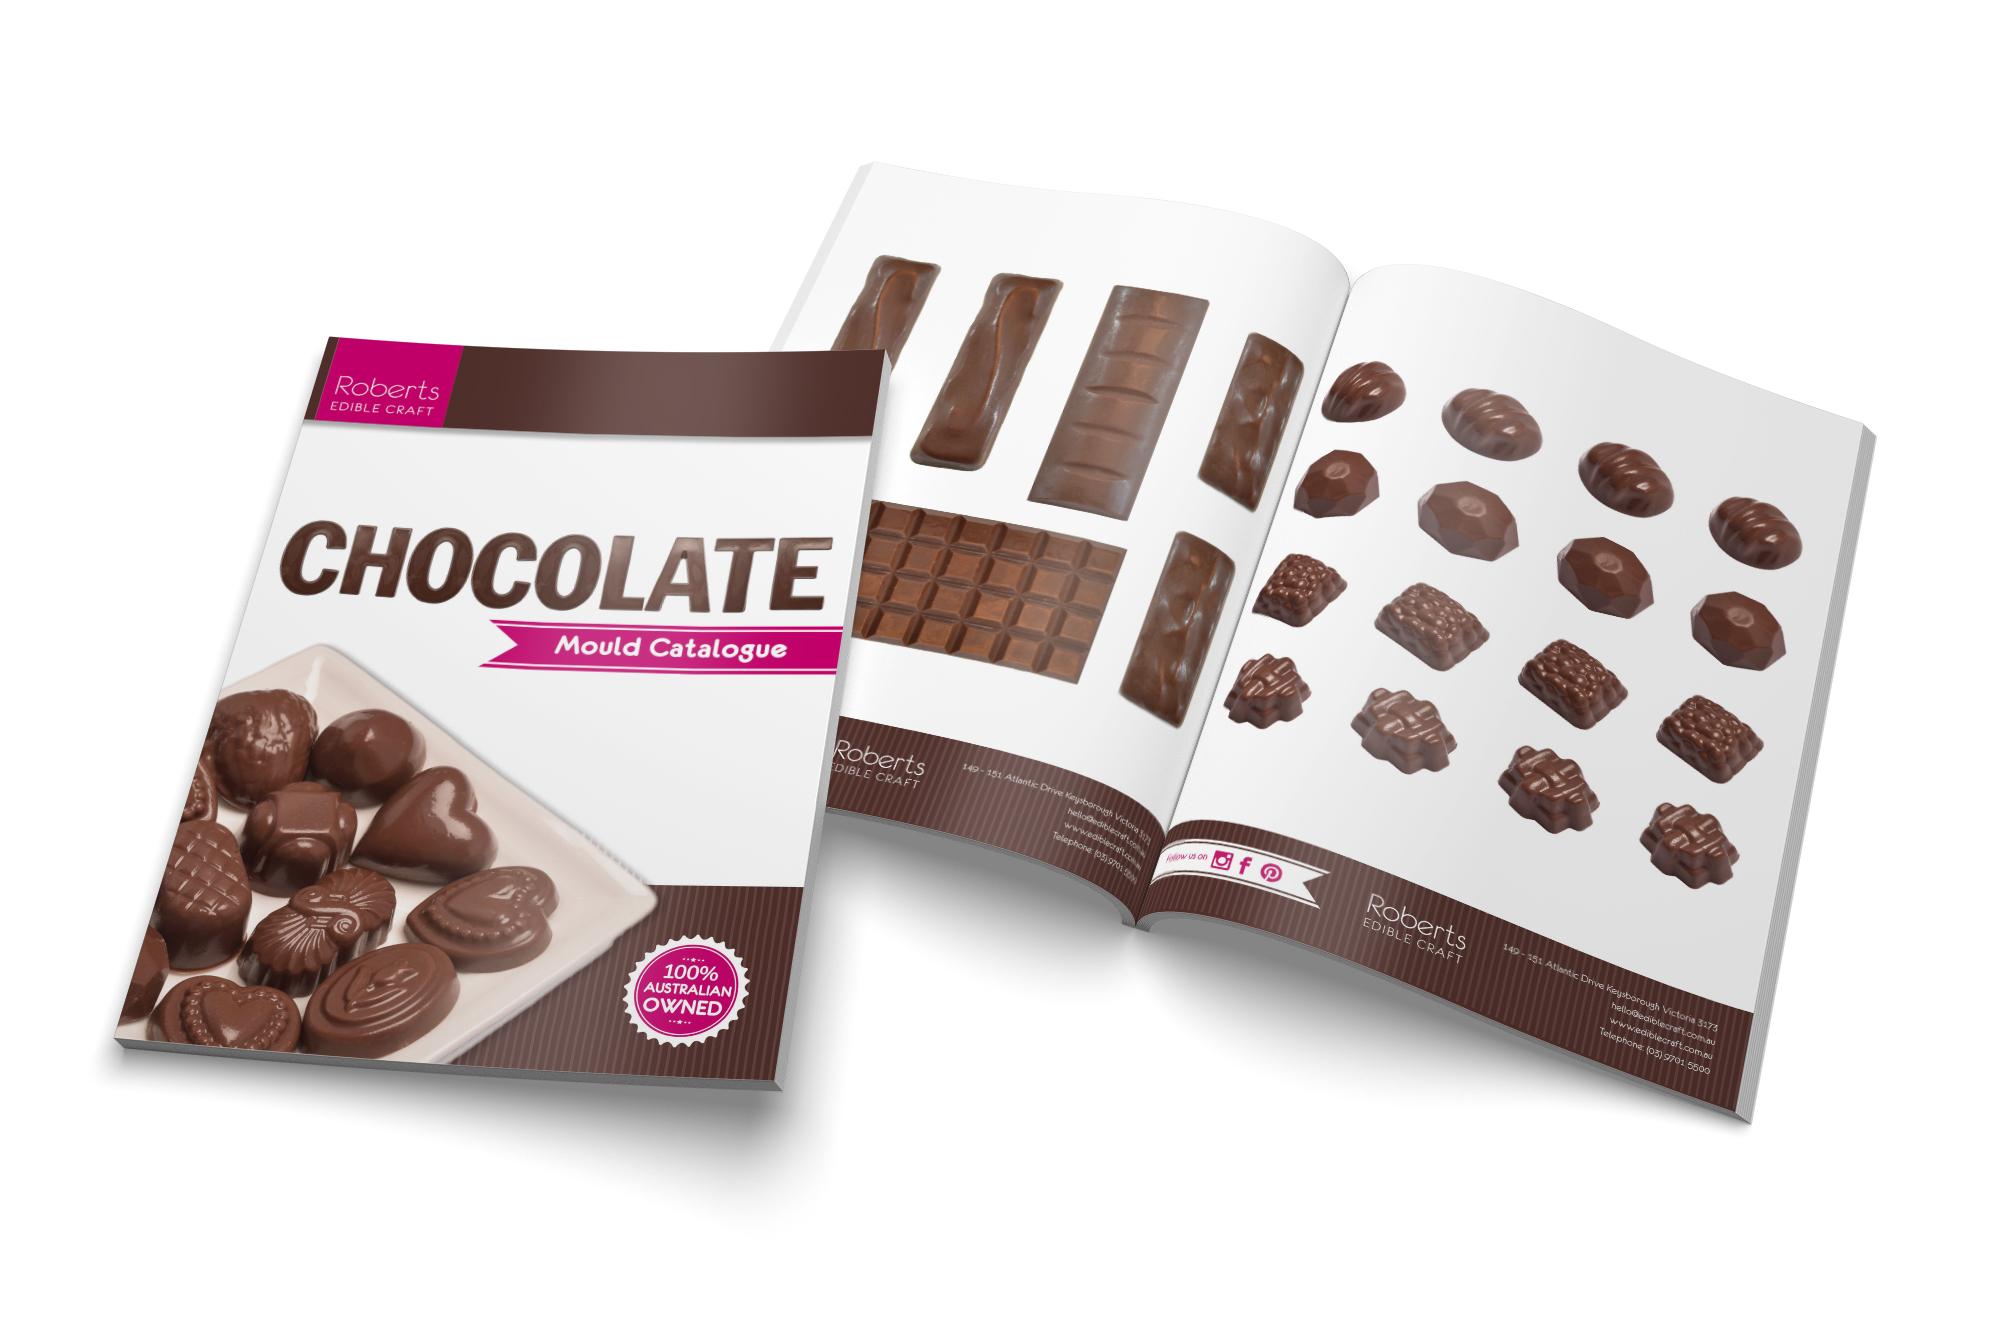 roberts-chocolate-catalogue-swatch.jpg